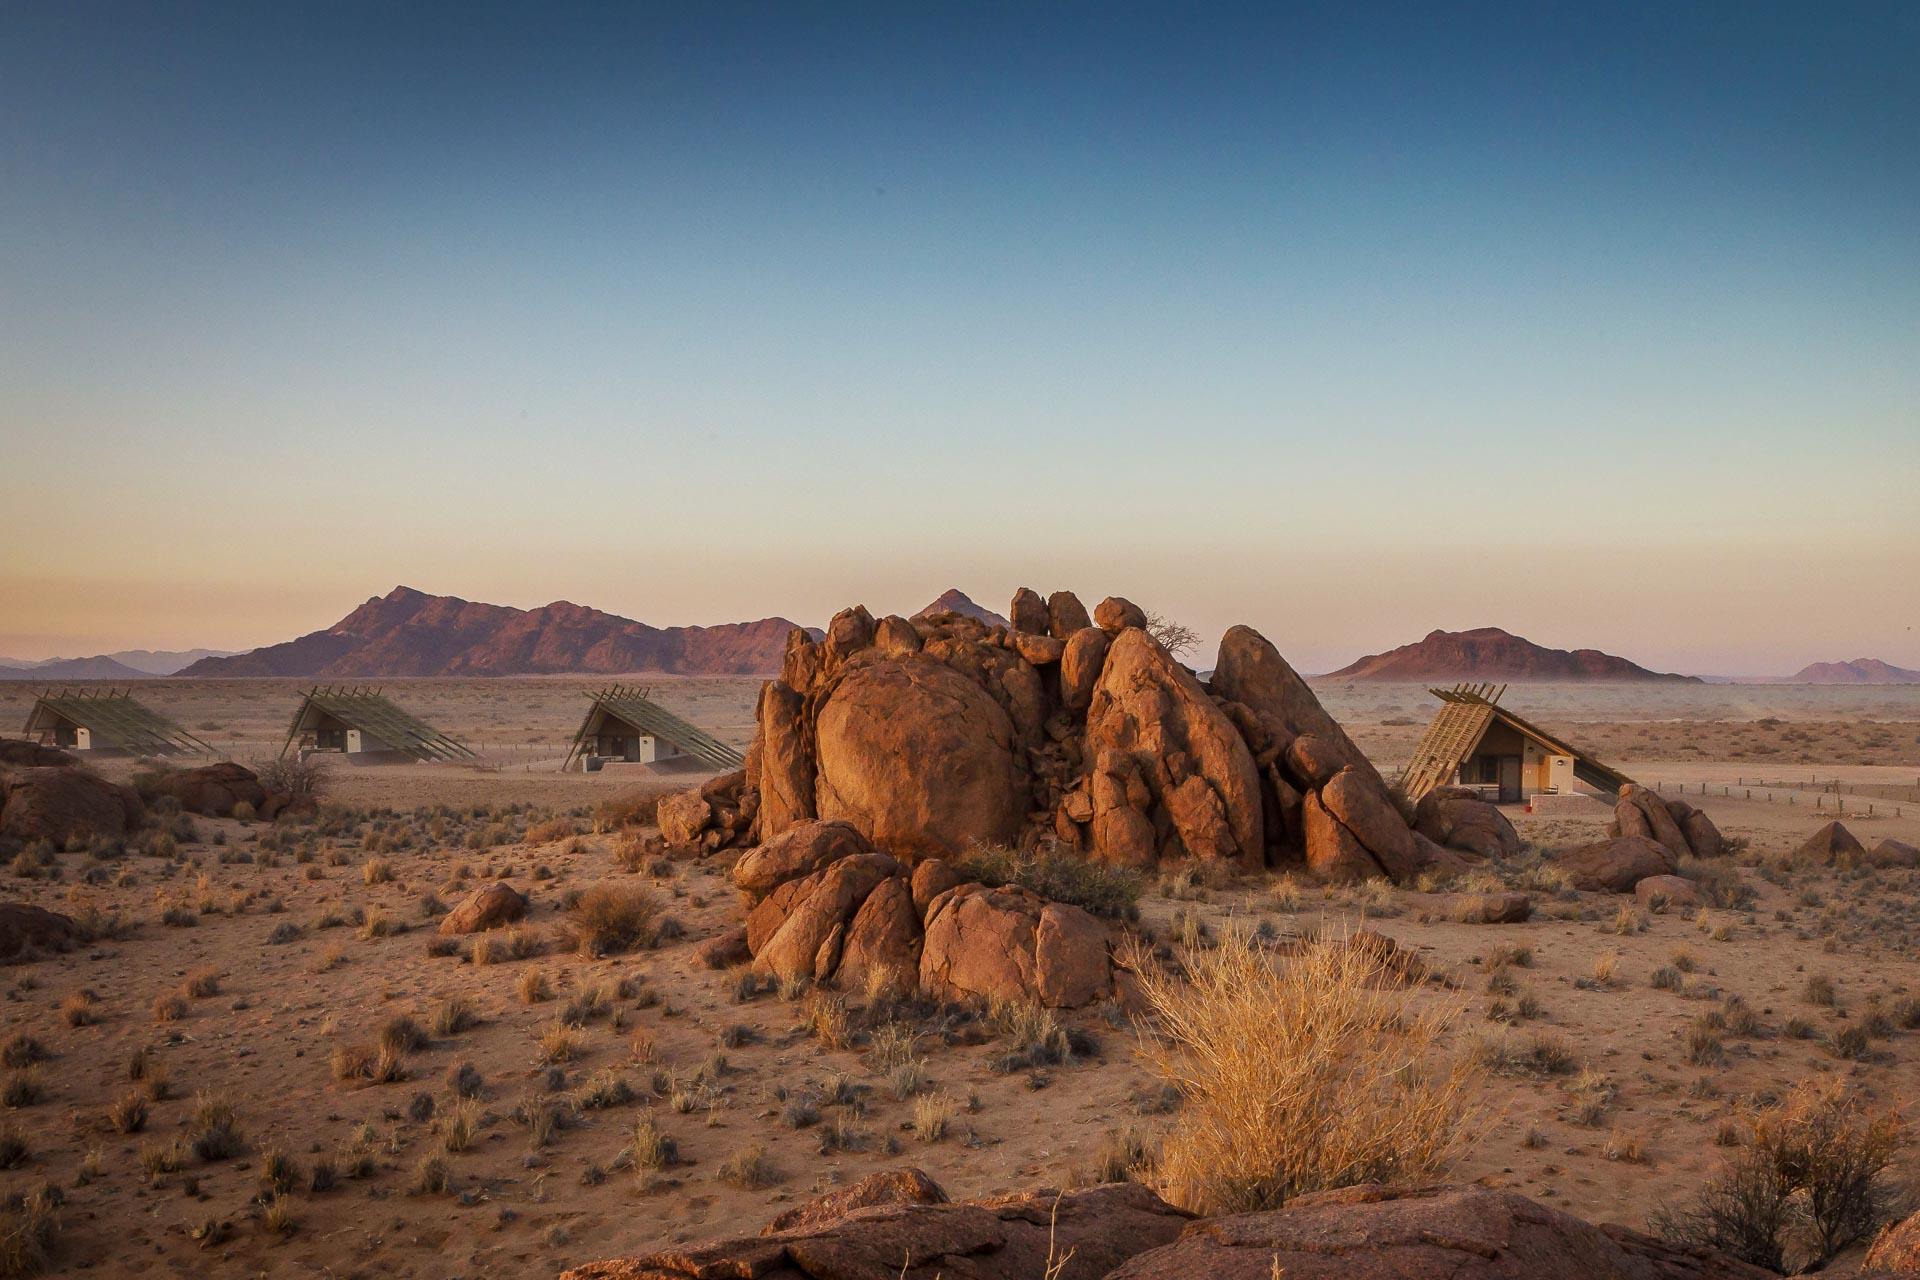 Desert-Quiver-Camp-Namibia-9